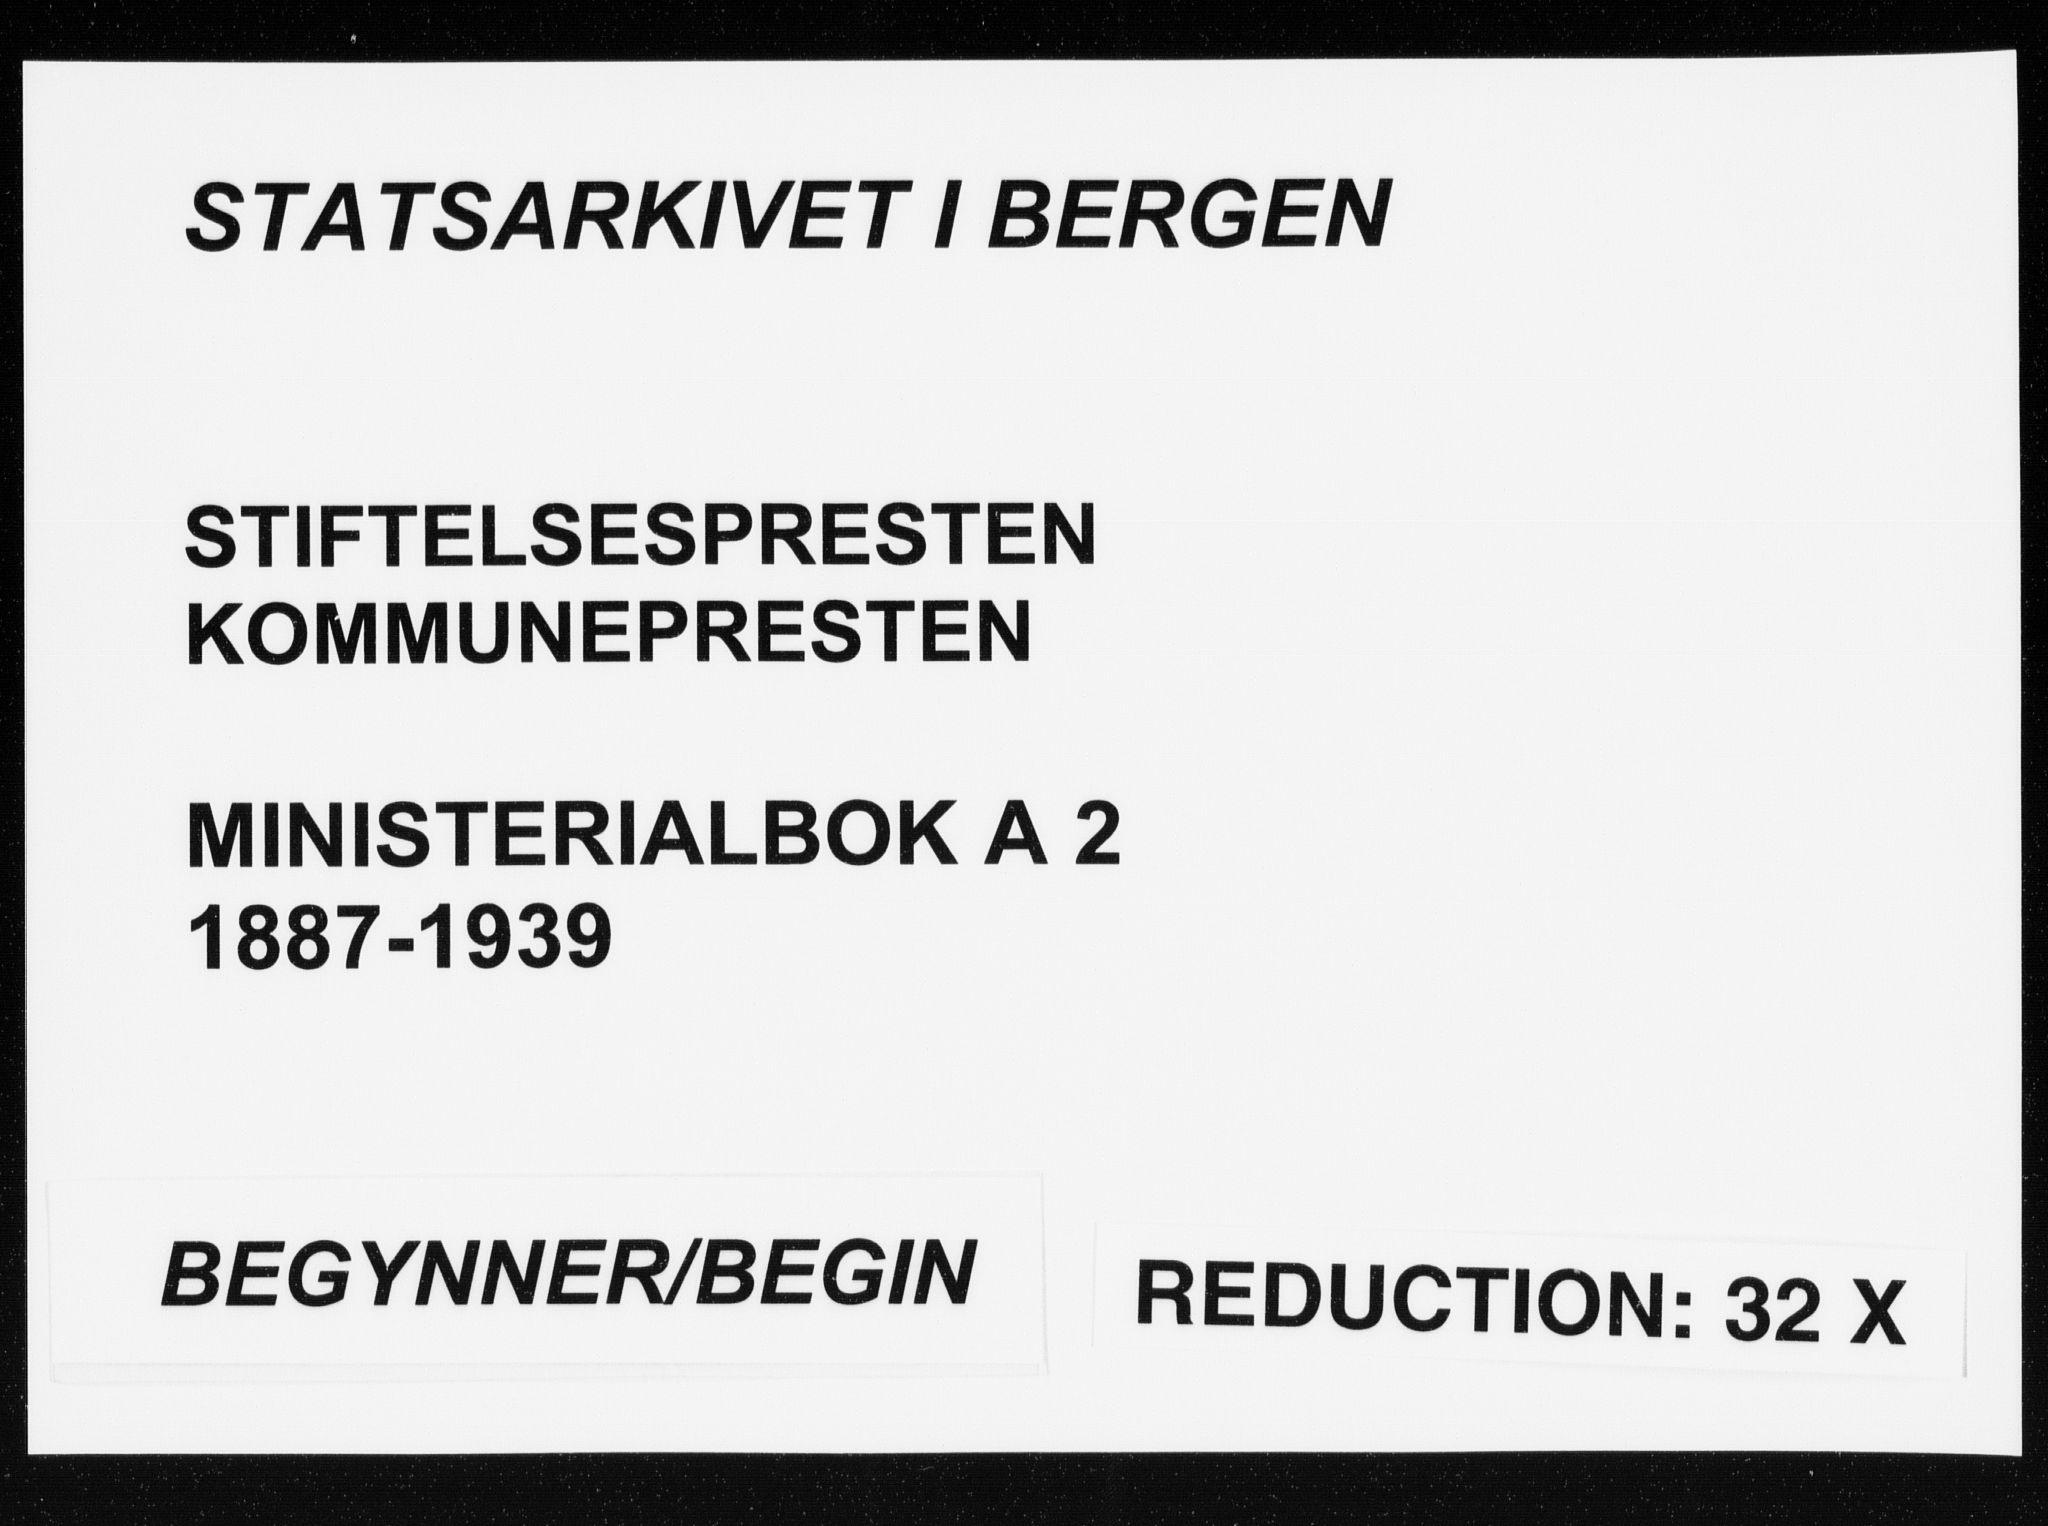 SAB, Arkivreferanse mangler*, Ministerialbok nr. A 2, 1887-1939